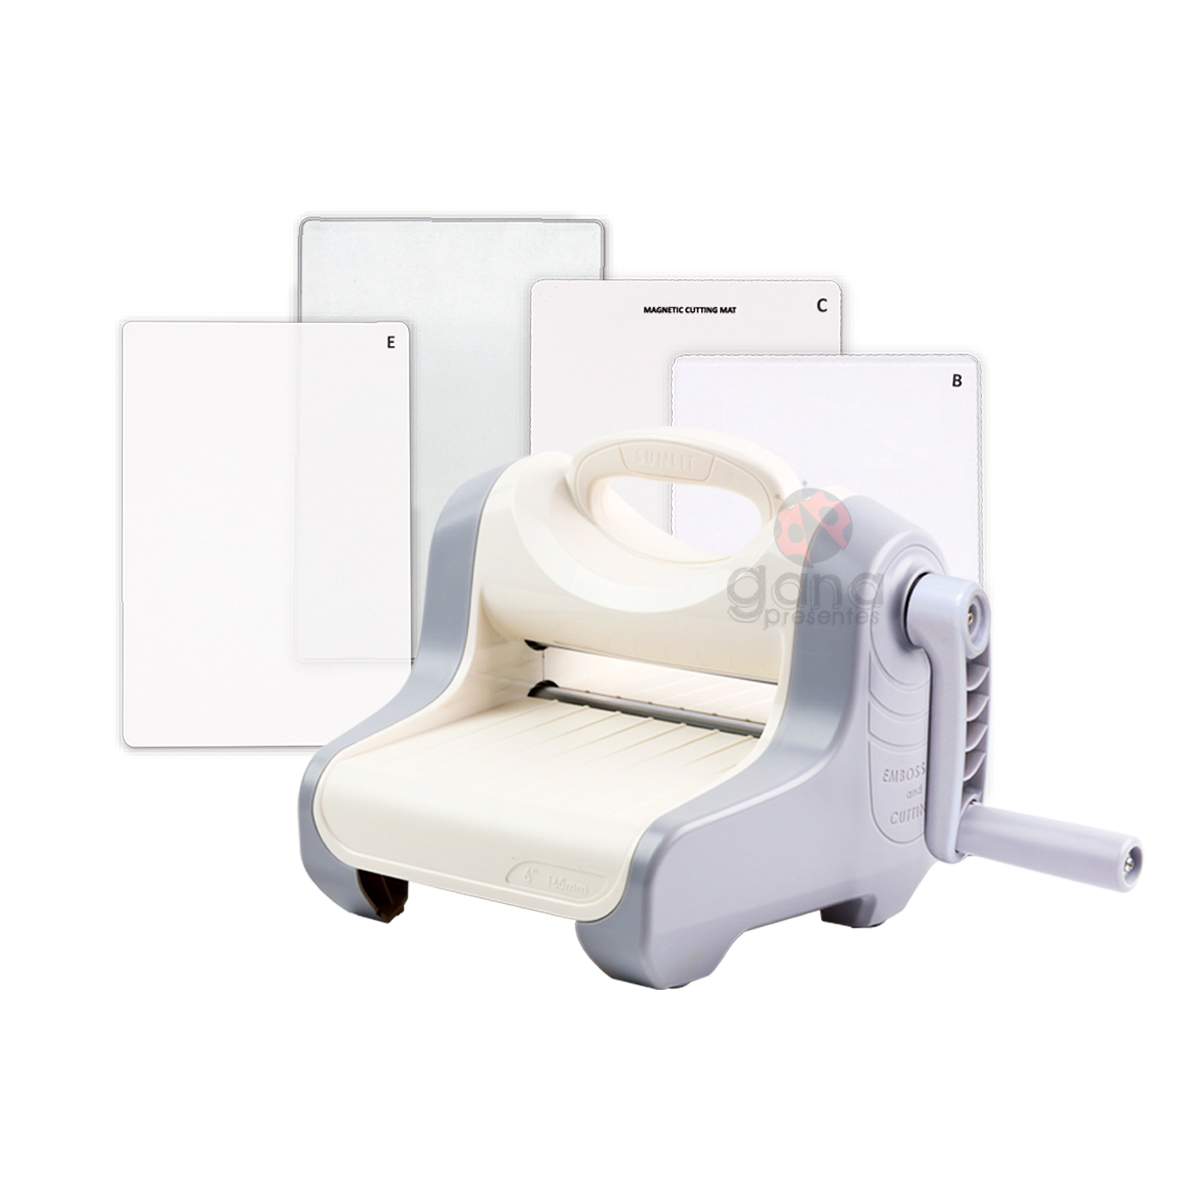 Maquina Para Corte E Relevo A5 -Sunlit - Emboss Cutting